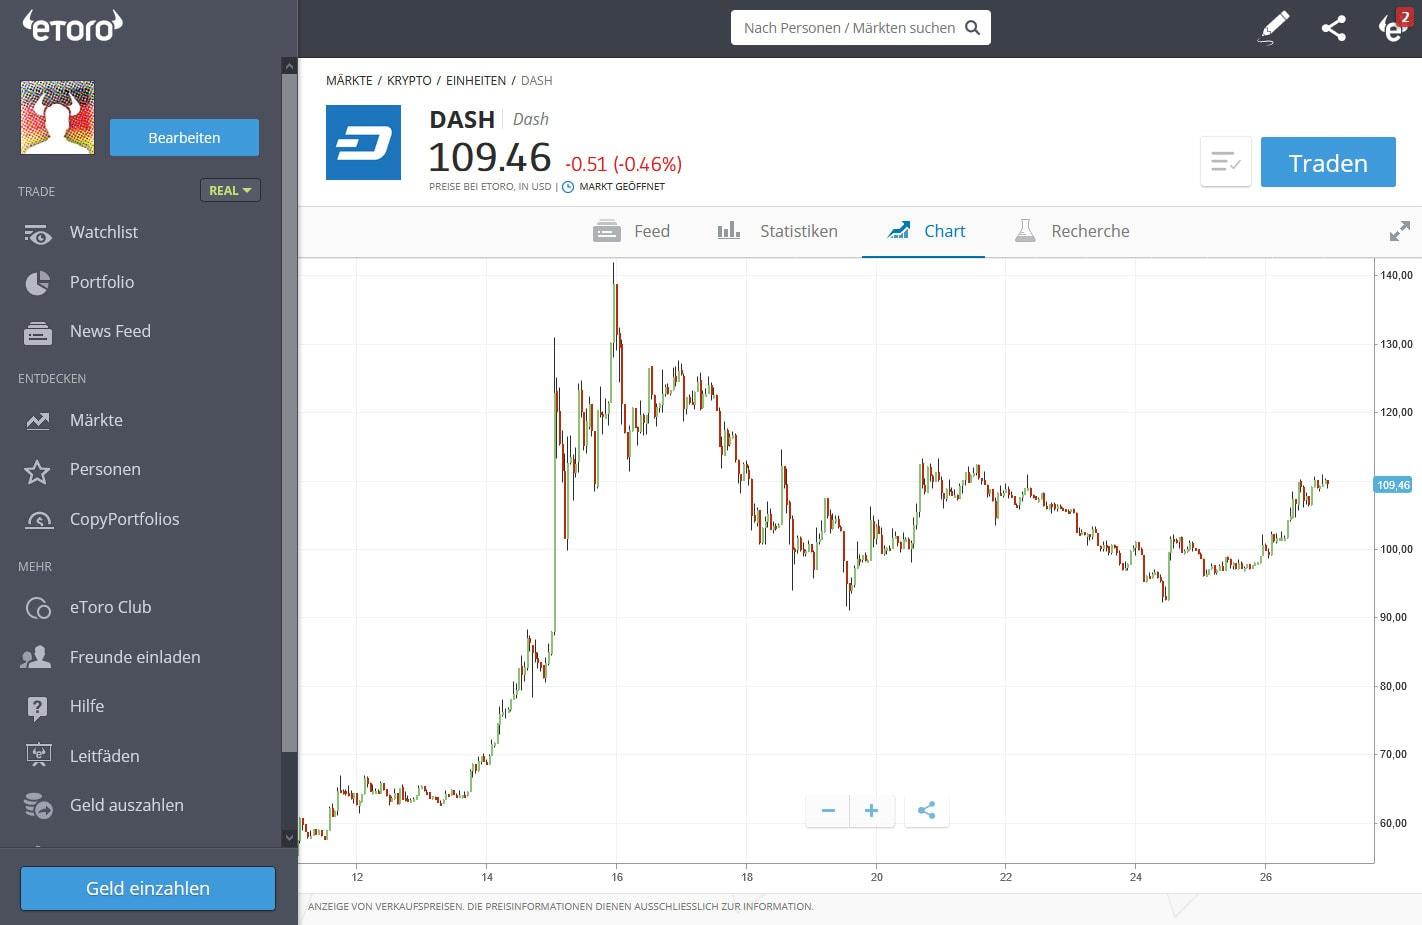 DASH Handelspaar auf eToro